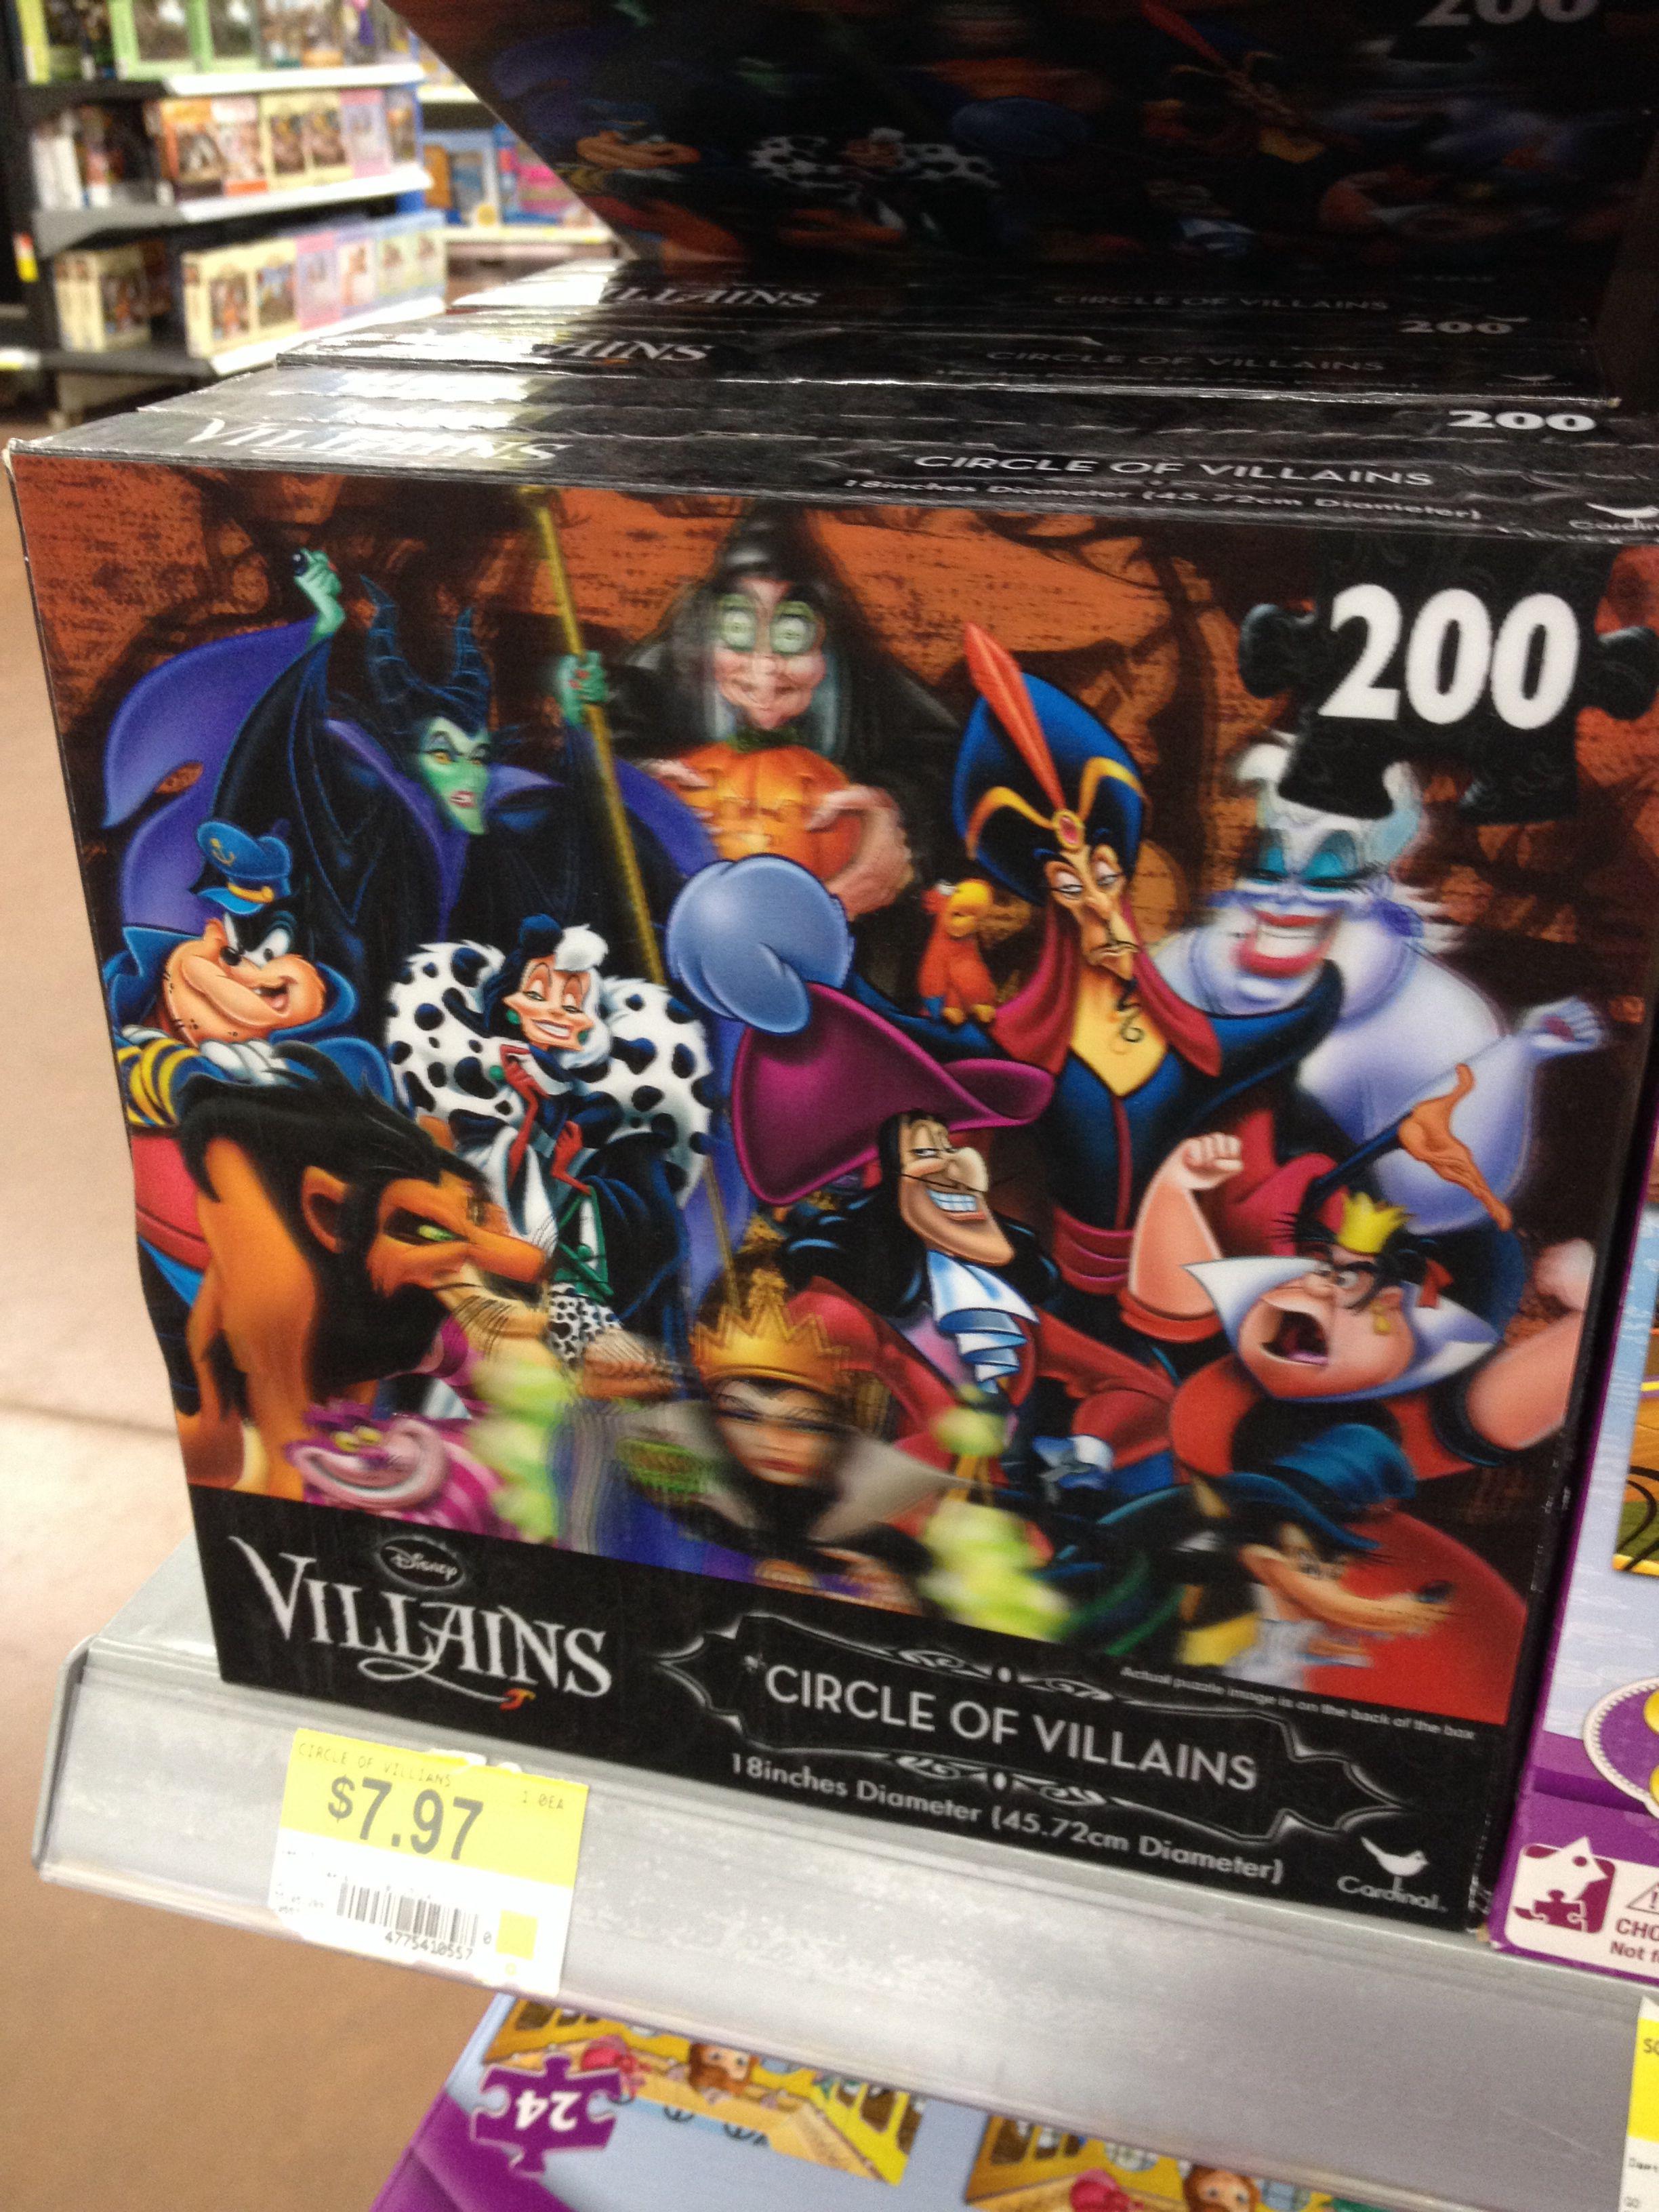 $8 for Disney villain puzzle - found at walmart